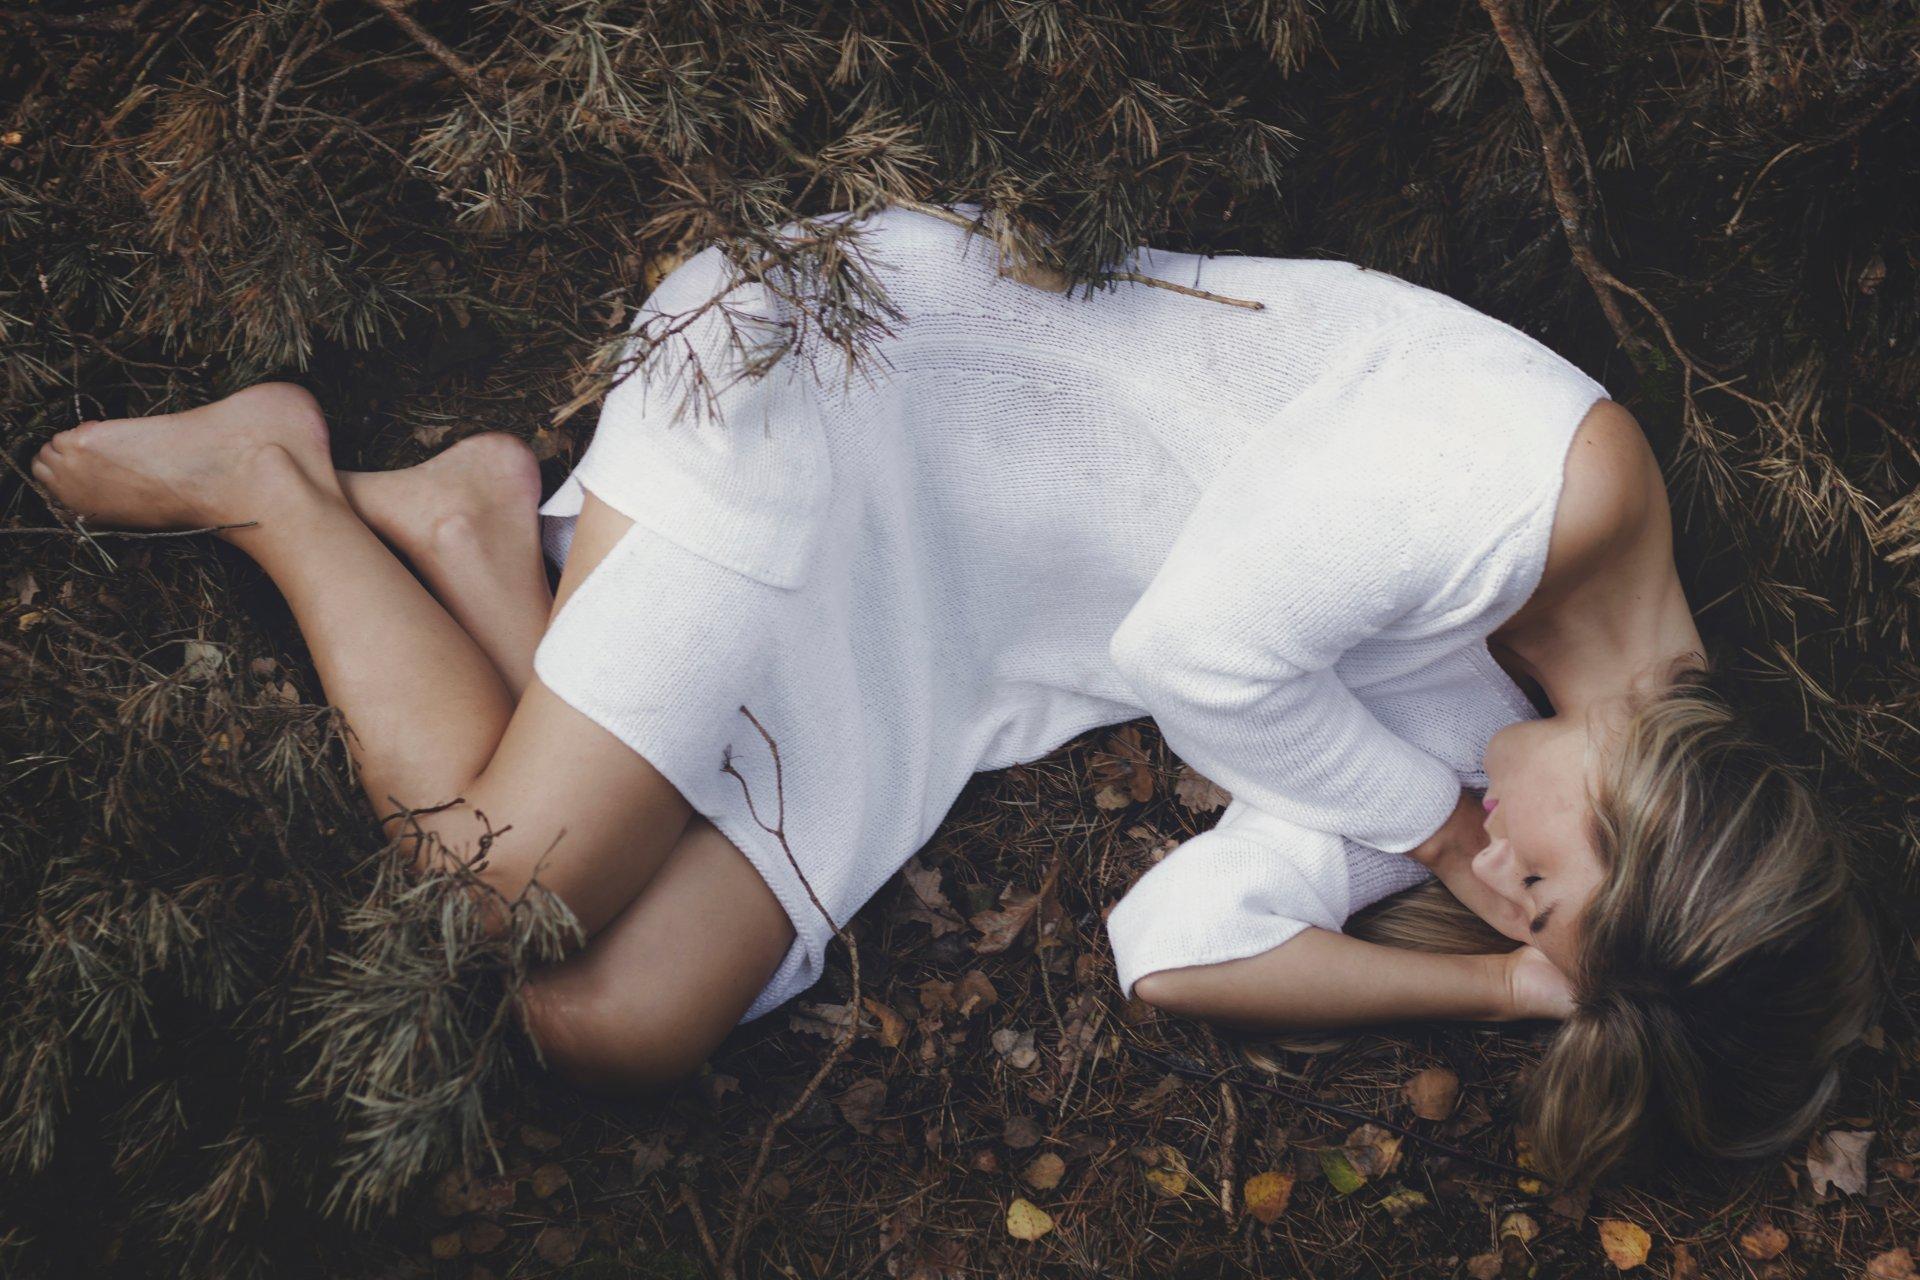 фото спят в лесу четко